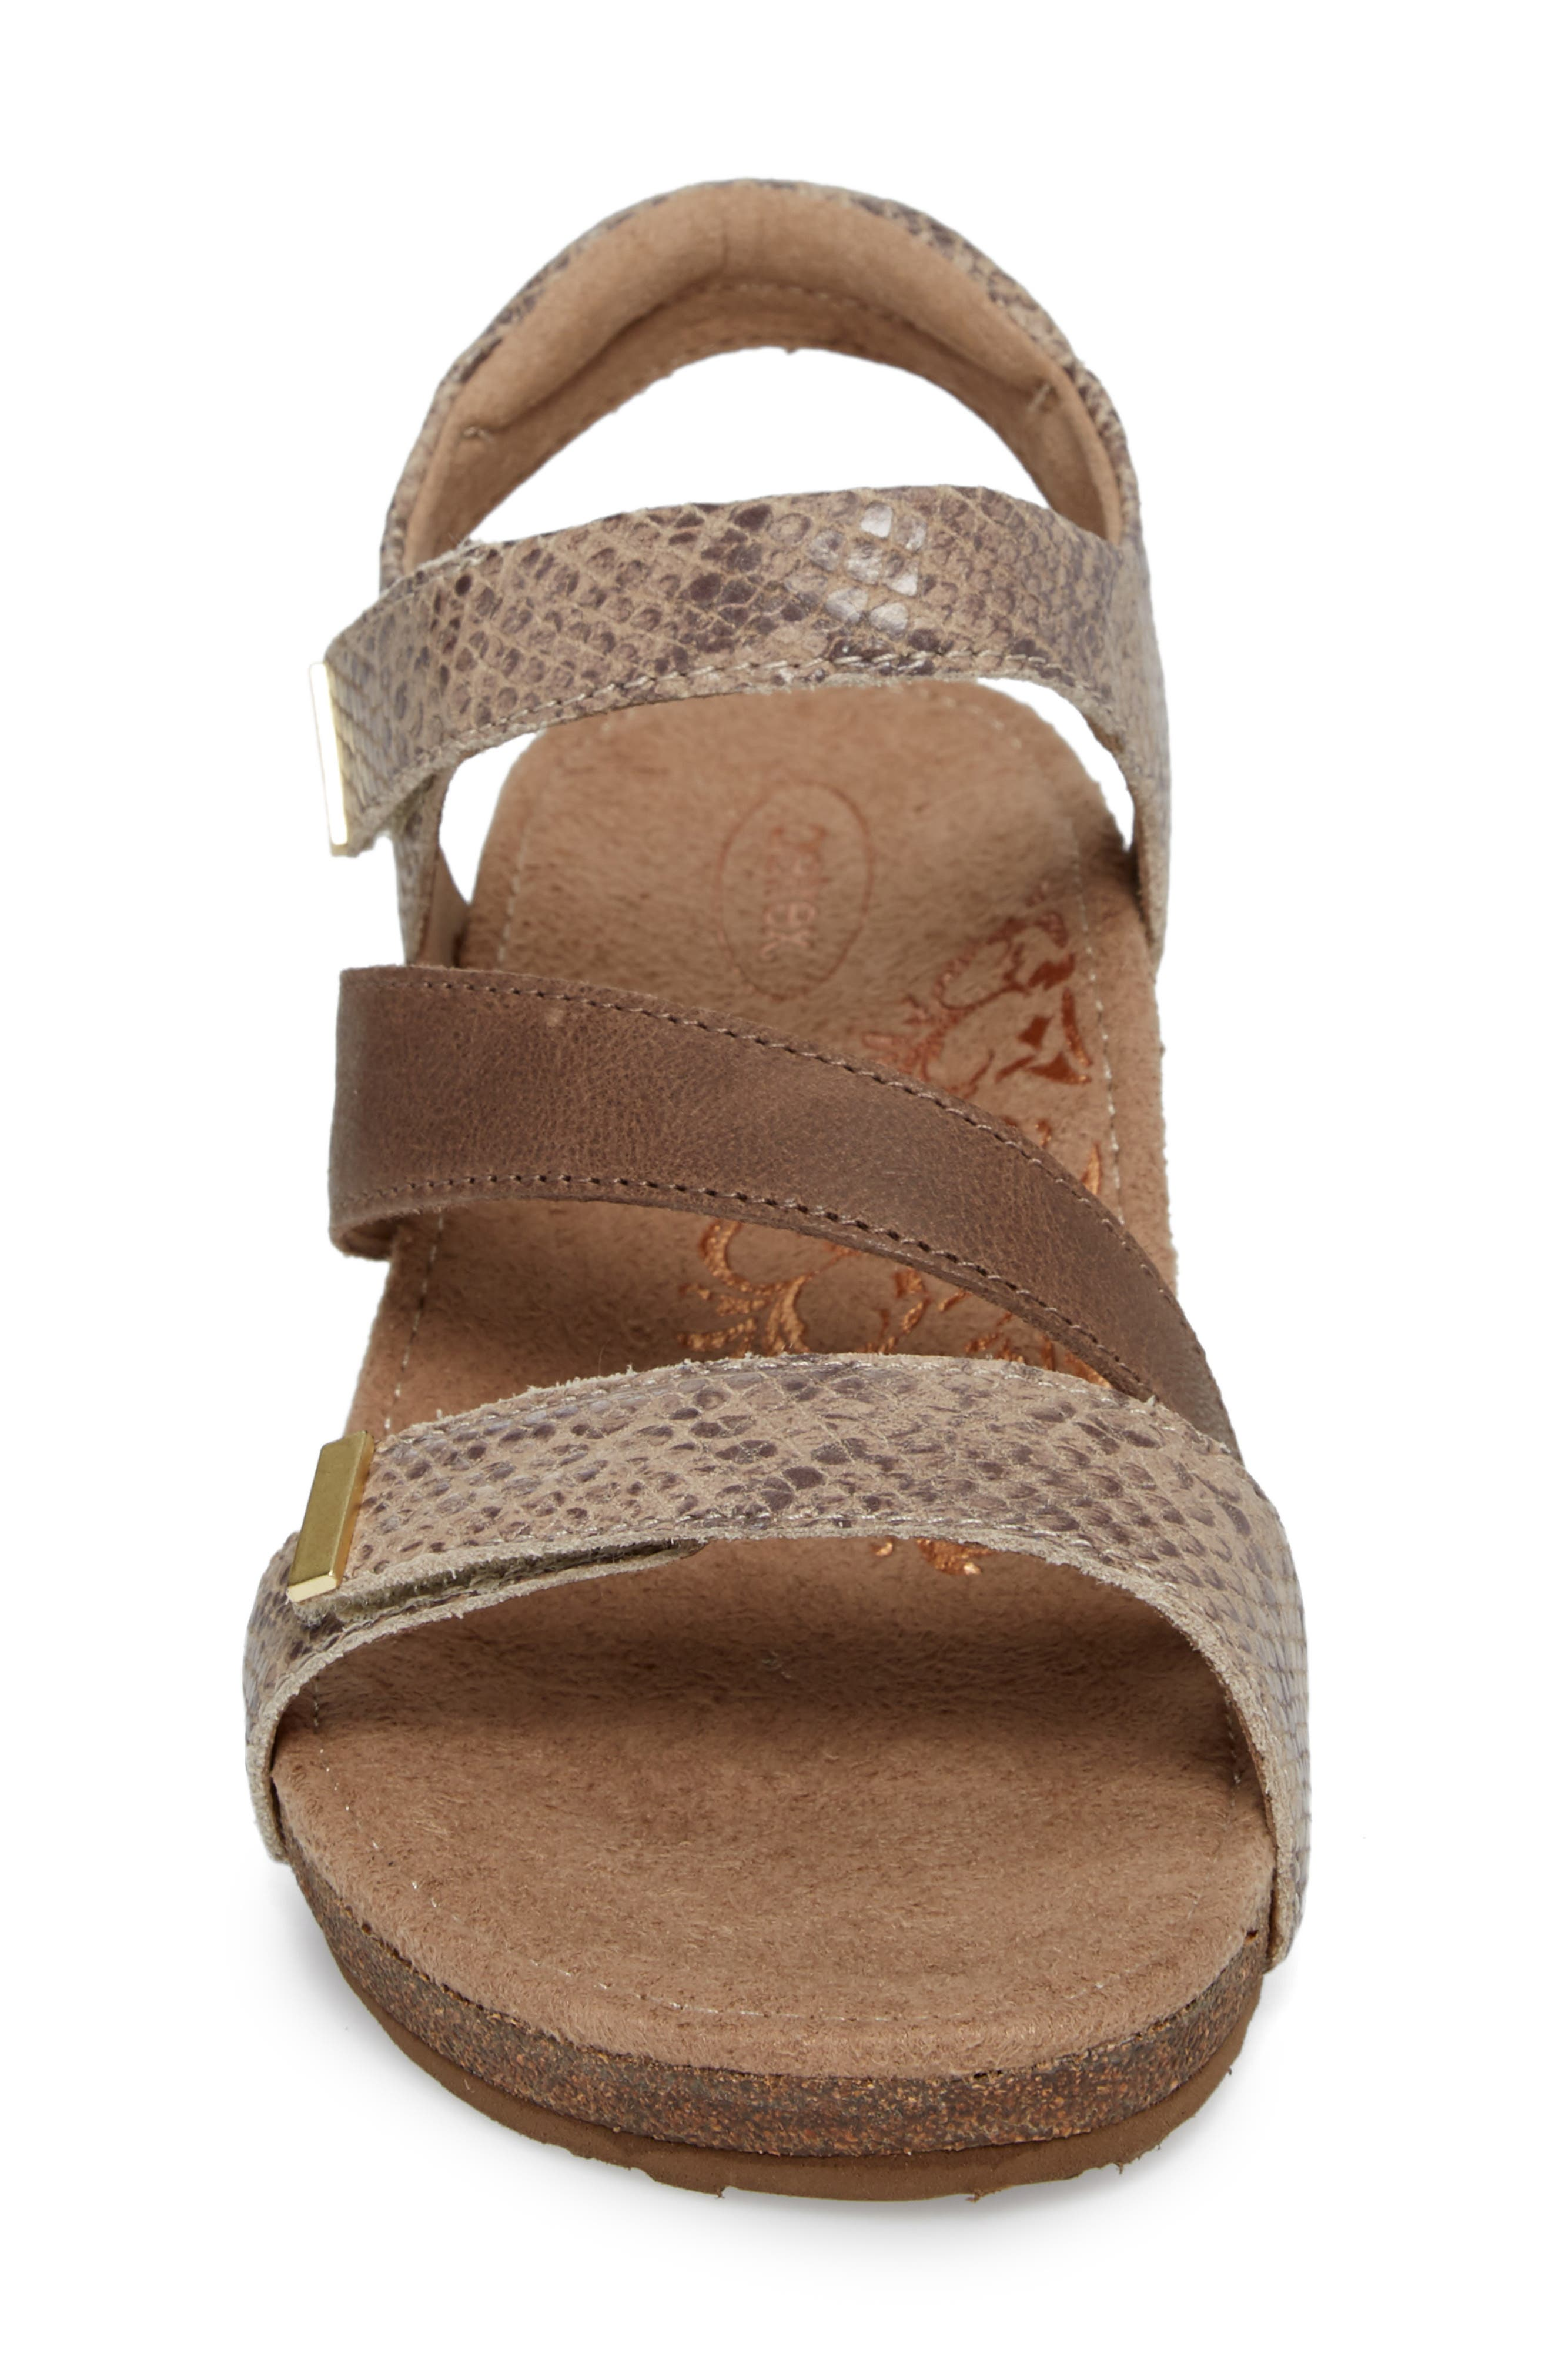 Brynn Asymmetrical Wedge Sandal,                             Alternate thumbnail 4, color,                             STONE SNAKE LEATHER